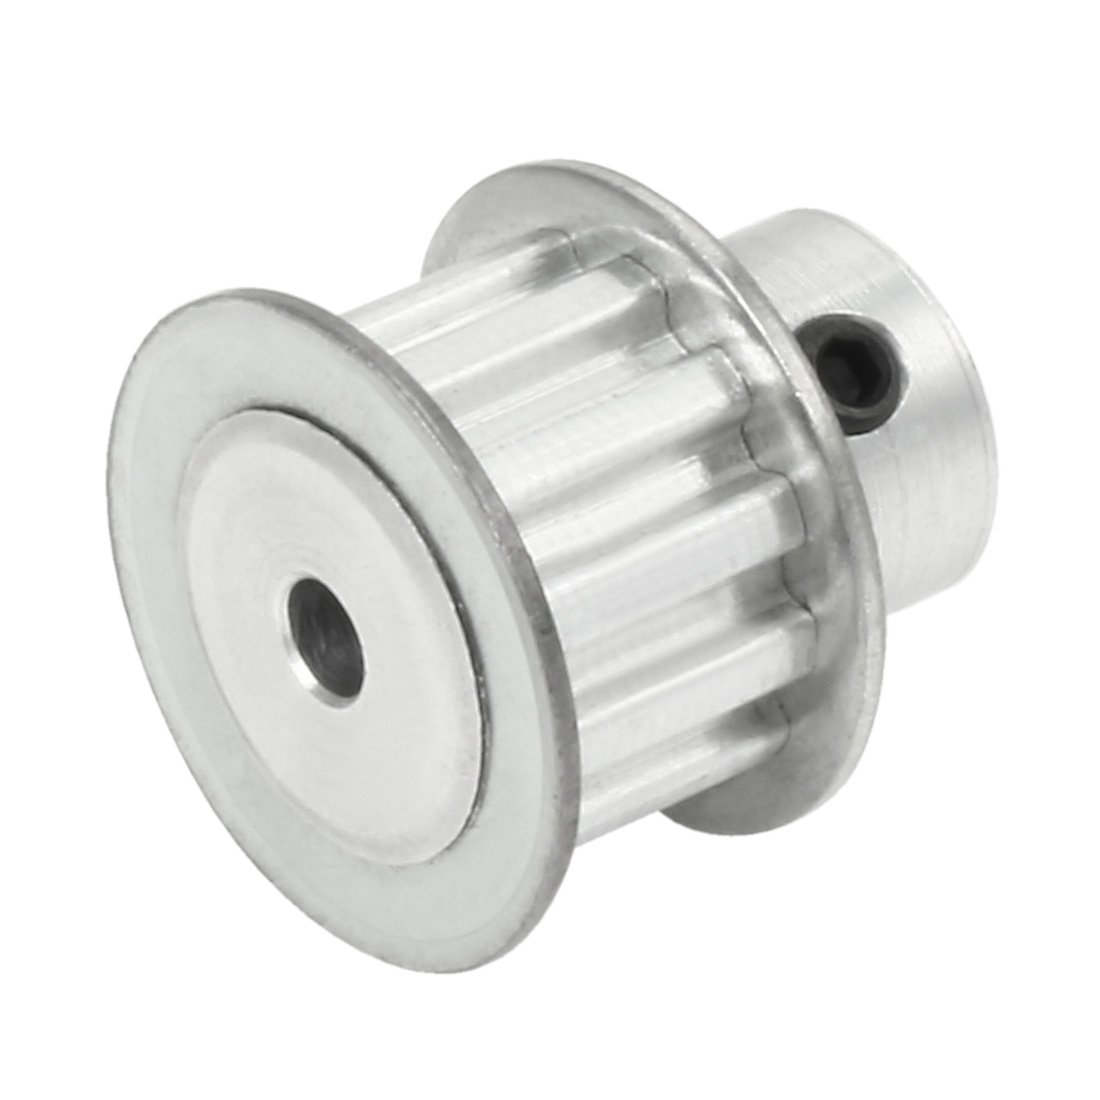 sourcingmap Aluminum 25 Teeth 5mmx4.5mm D-Shape Bore 27mm Belt Timing Idler Pulley Wheel Silver Tone